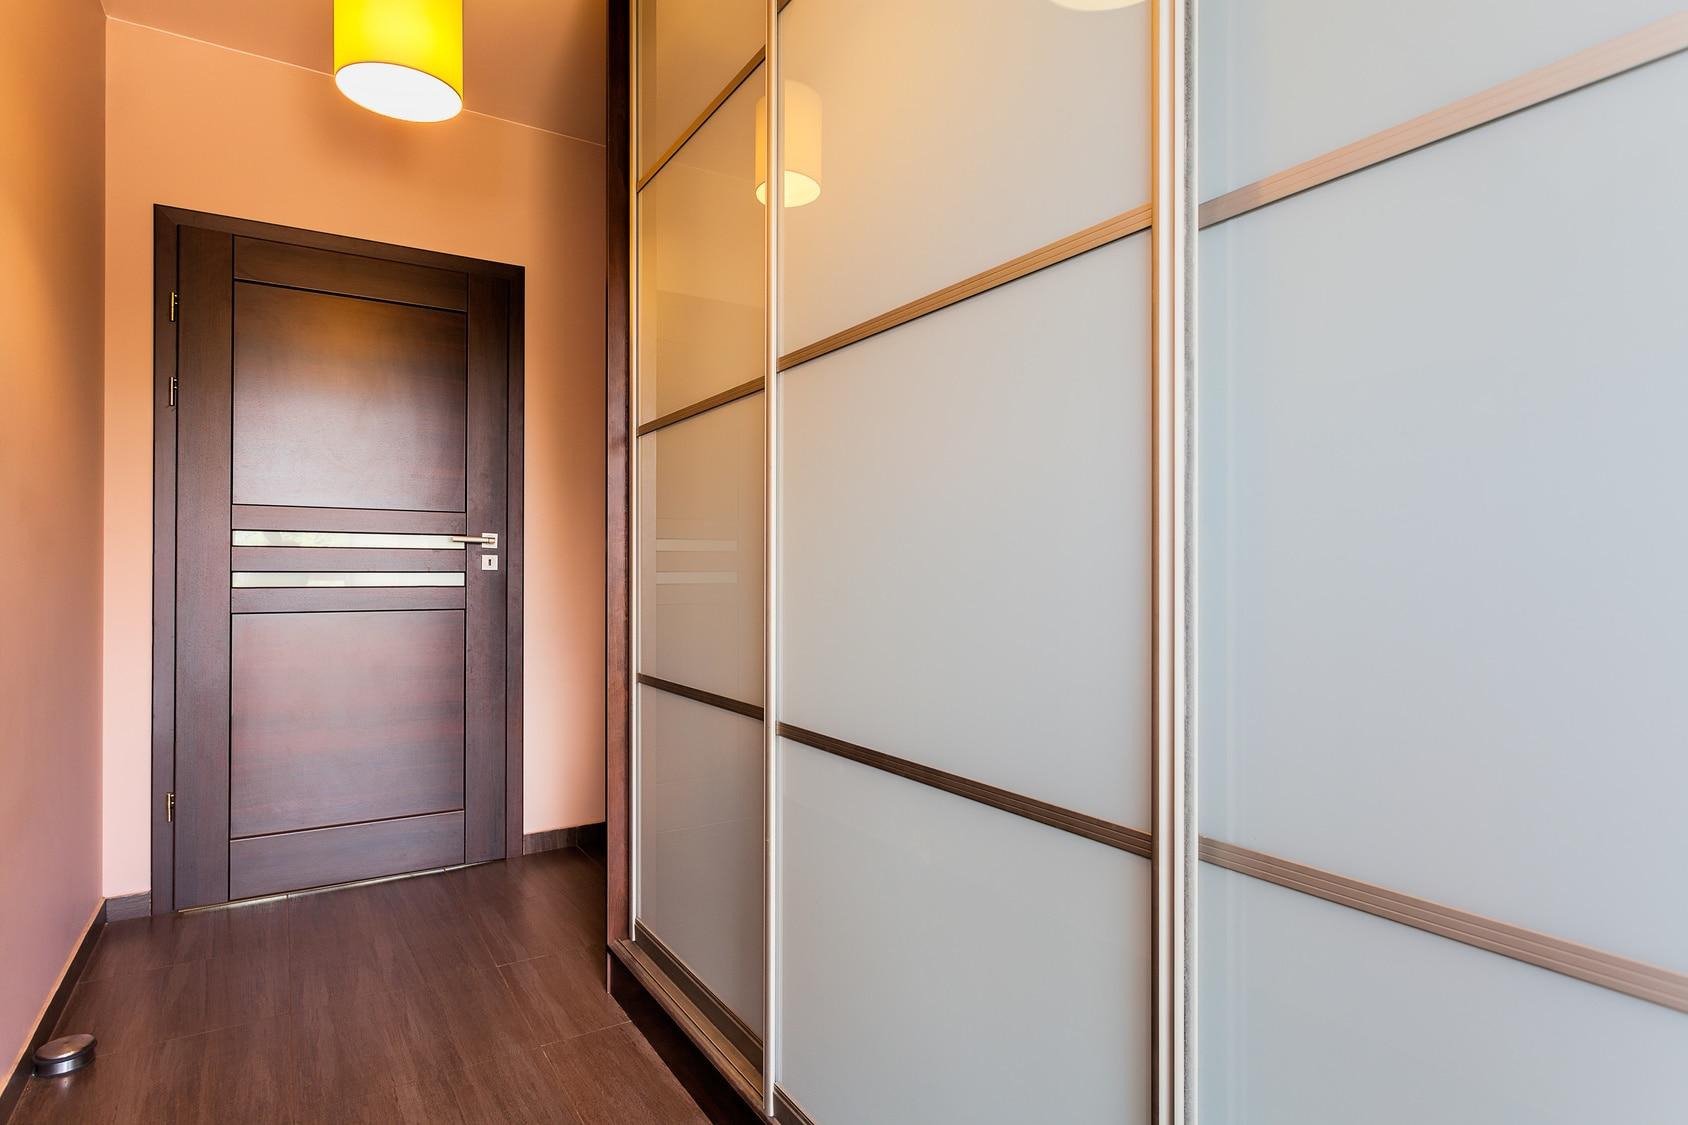 jak zabudowa szaf wn kow porady leroy merlin. Black Bedroom Furniture Sets. Home Design Ideas